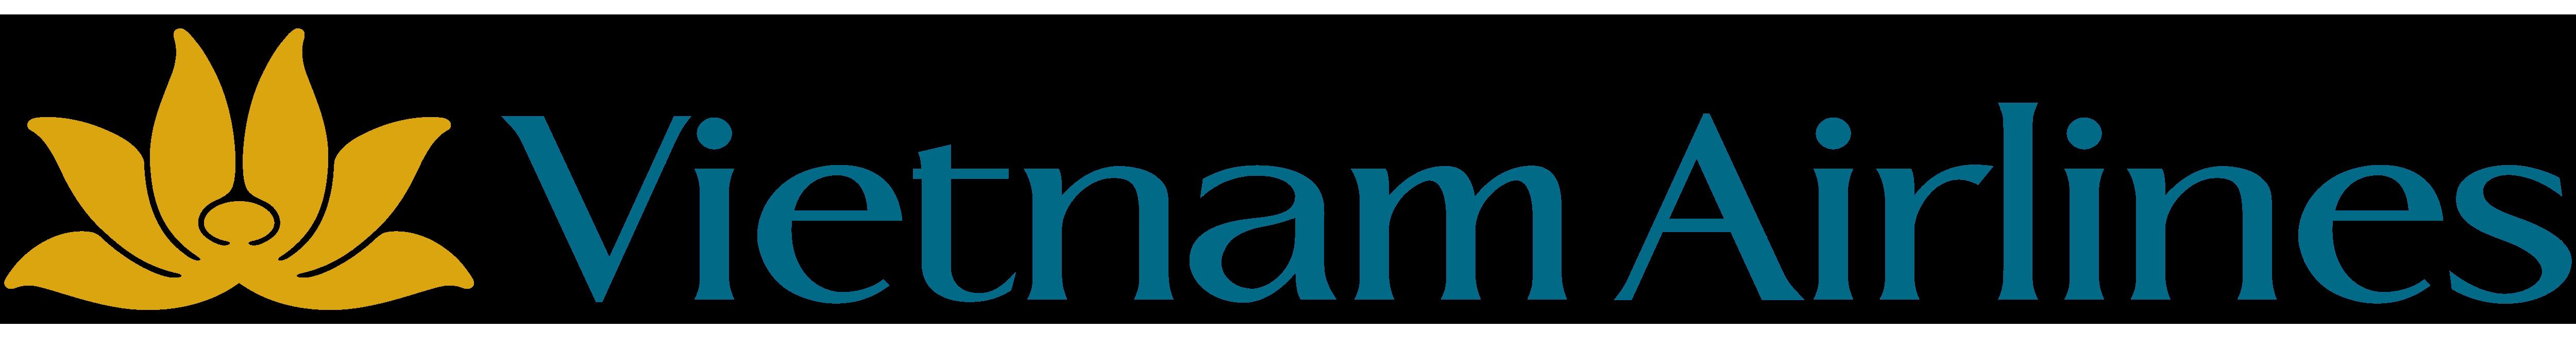 Vietnam Airlines PNG - 38195